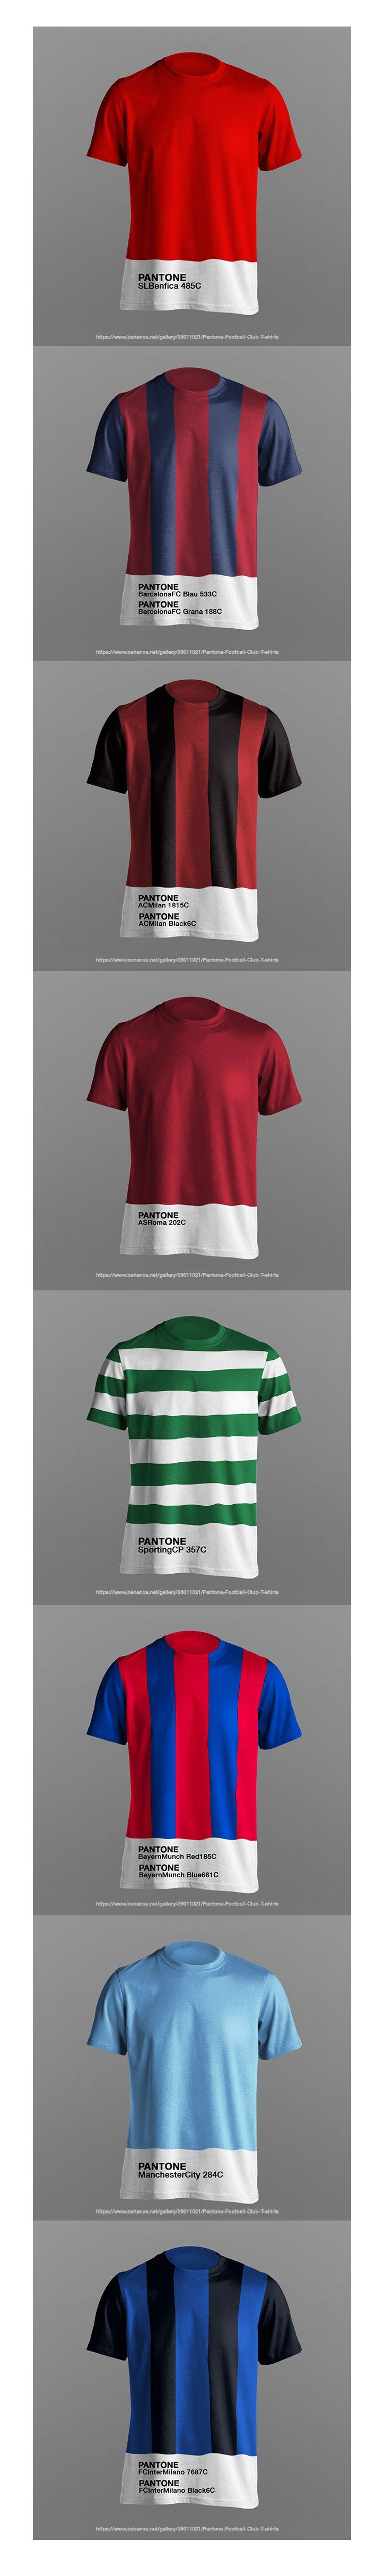 Imagine if Pantone Color Brand could make the new football club t-shirt.  #Football #Soccer #Barcelona #BayernMunch #Benfica #Pantone #pantonecolors #color #colours #messi #robben